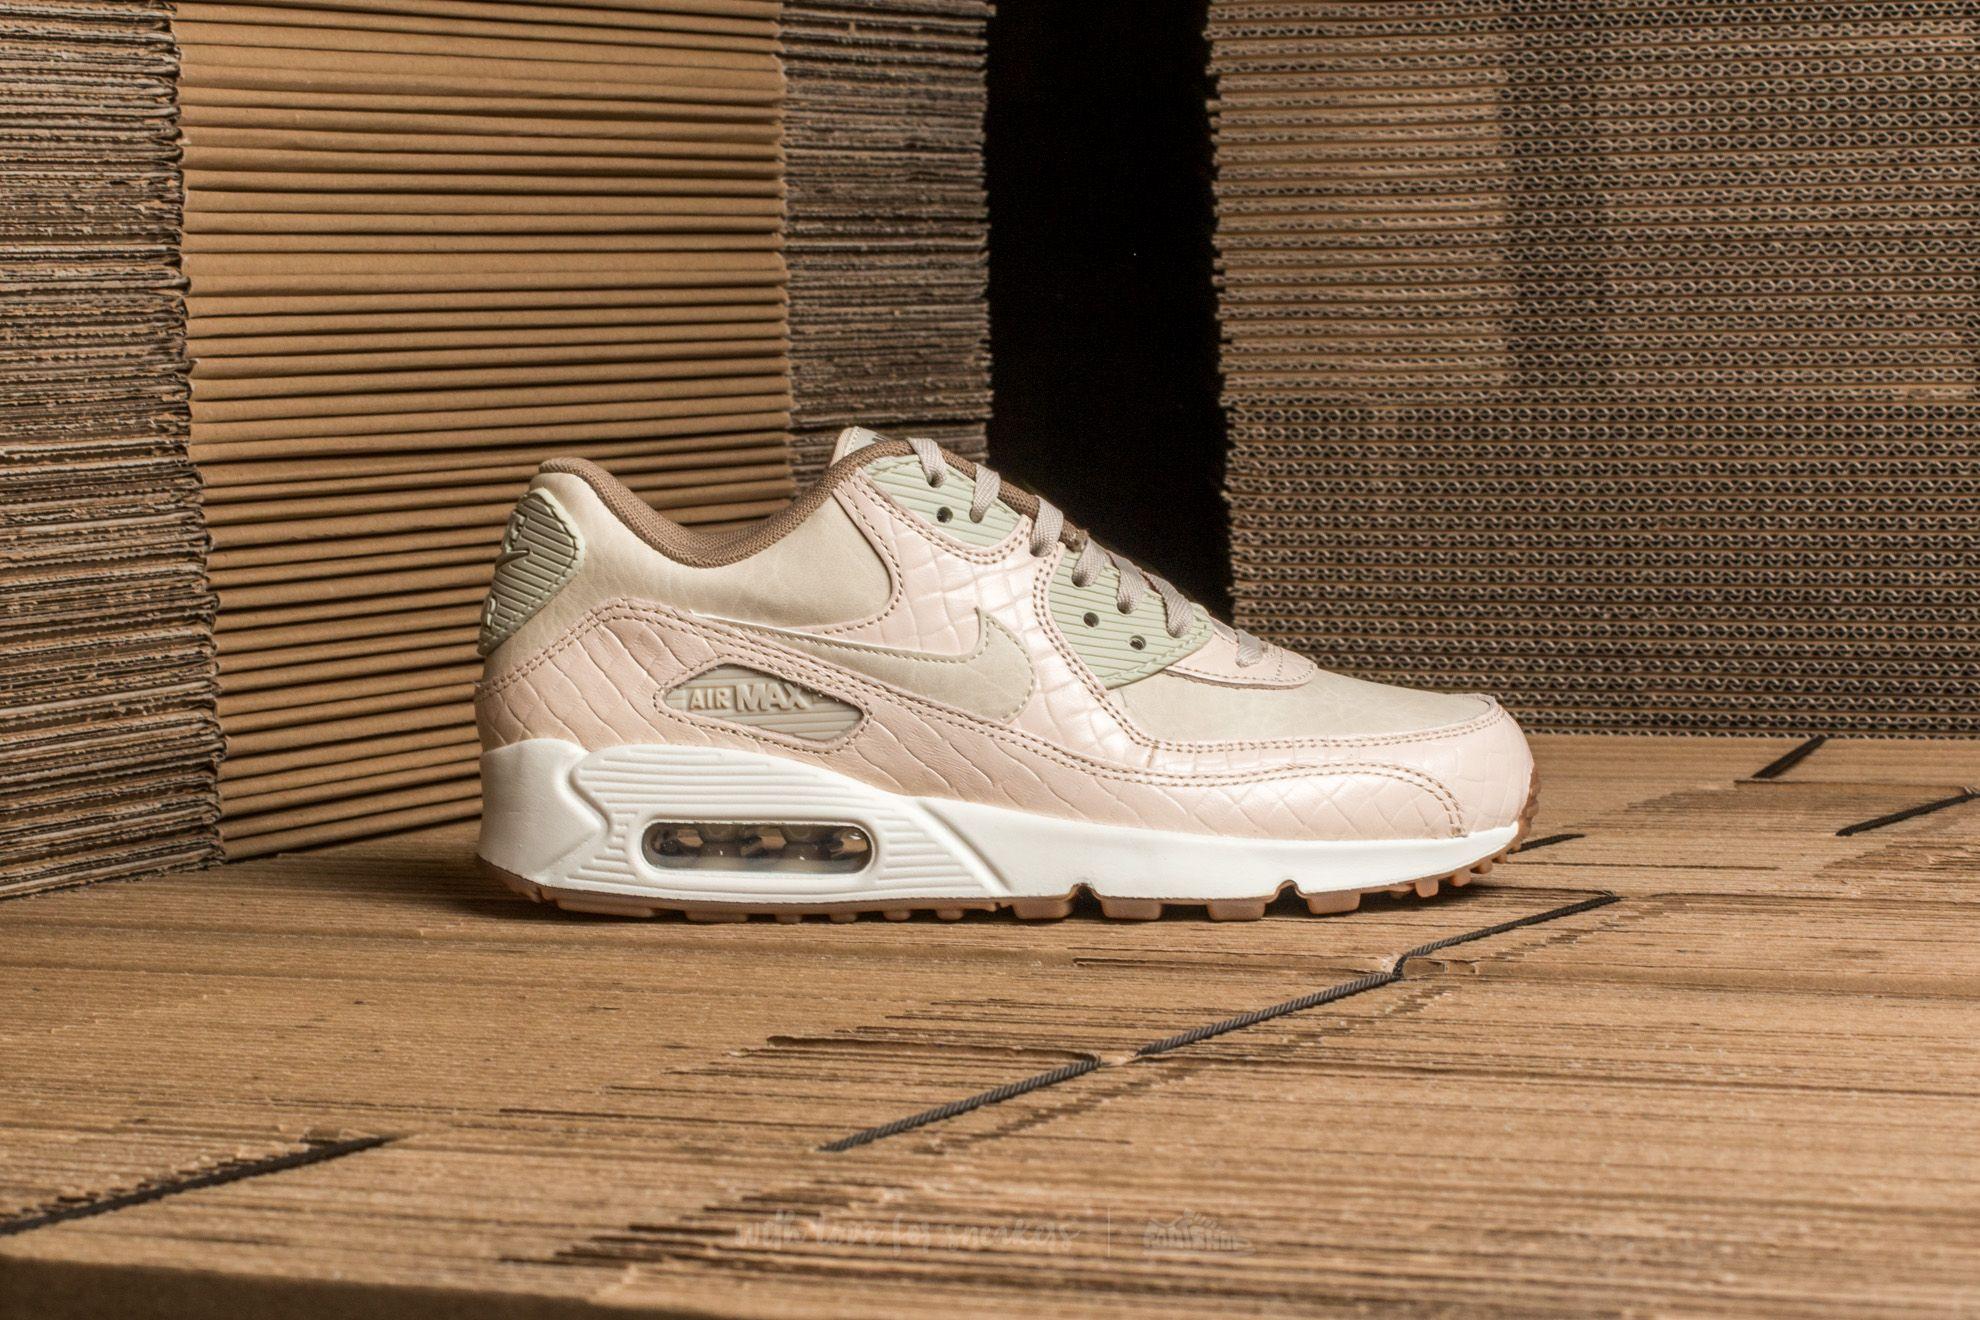 Nike Damen Sneaker Air Max 90 PREM OatmealOatmeal Sail Khaki